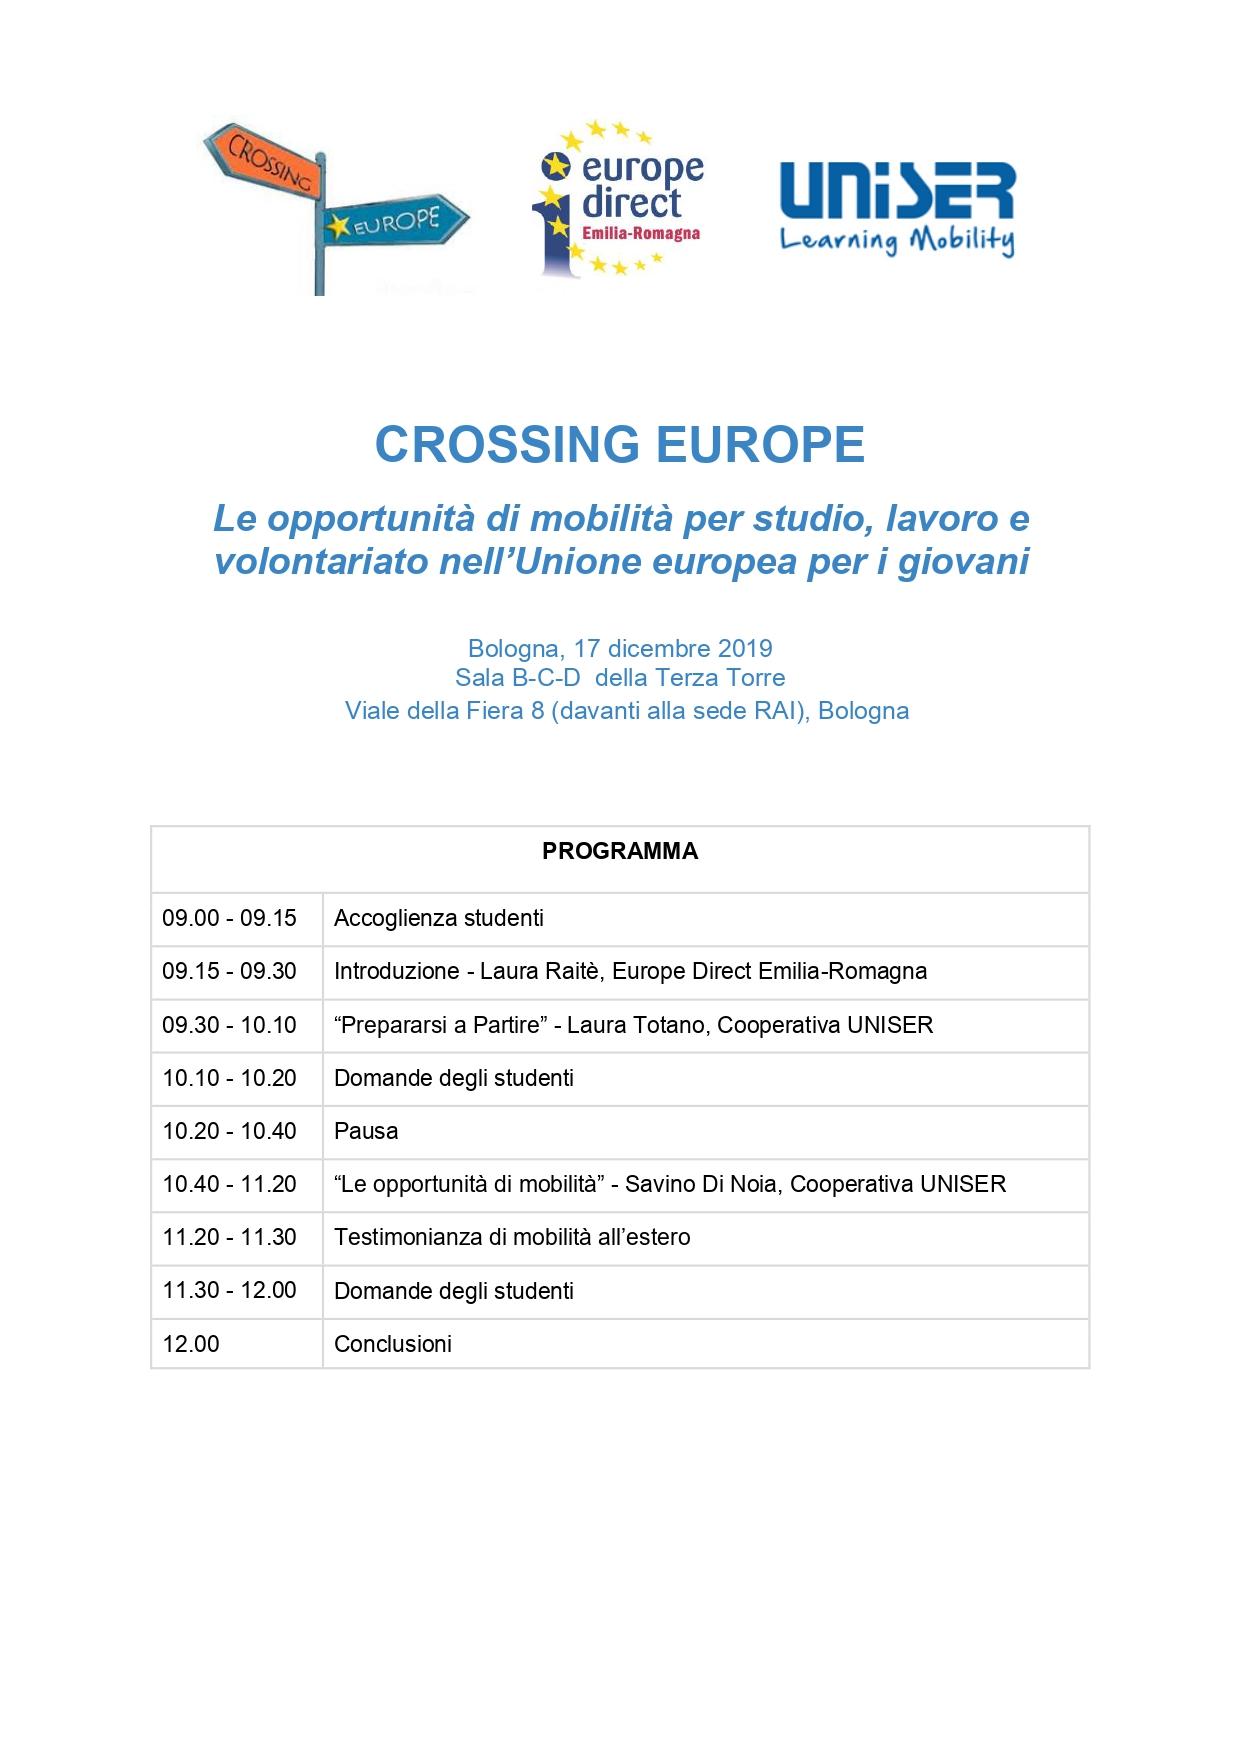 crossing europe 17 dicembre 2019